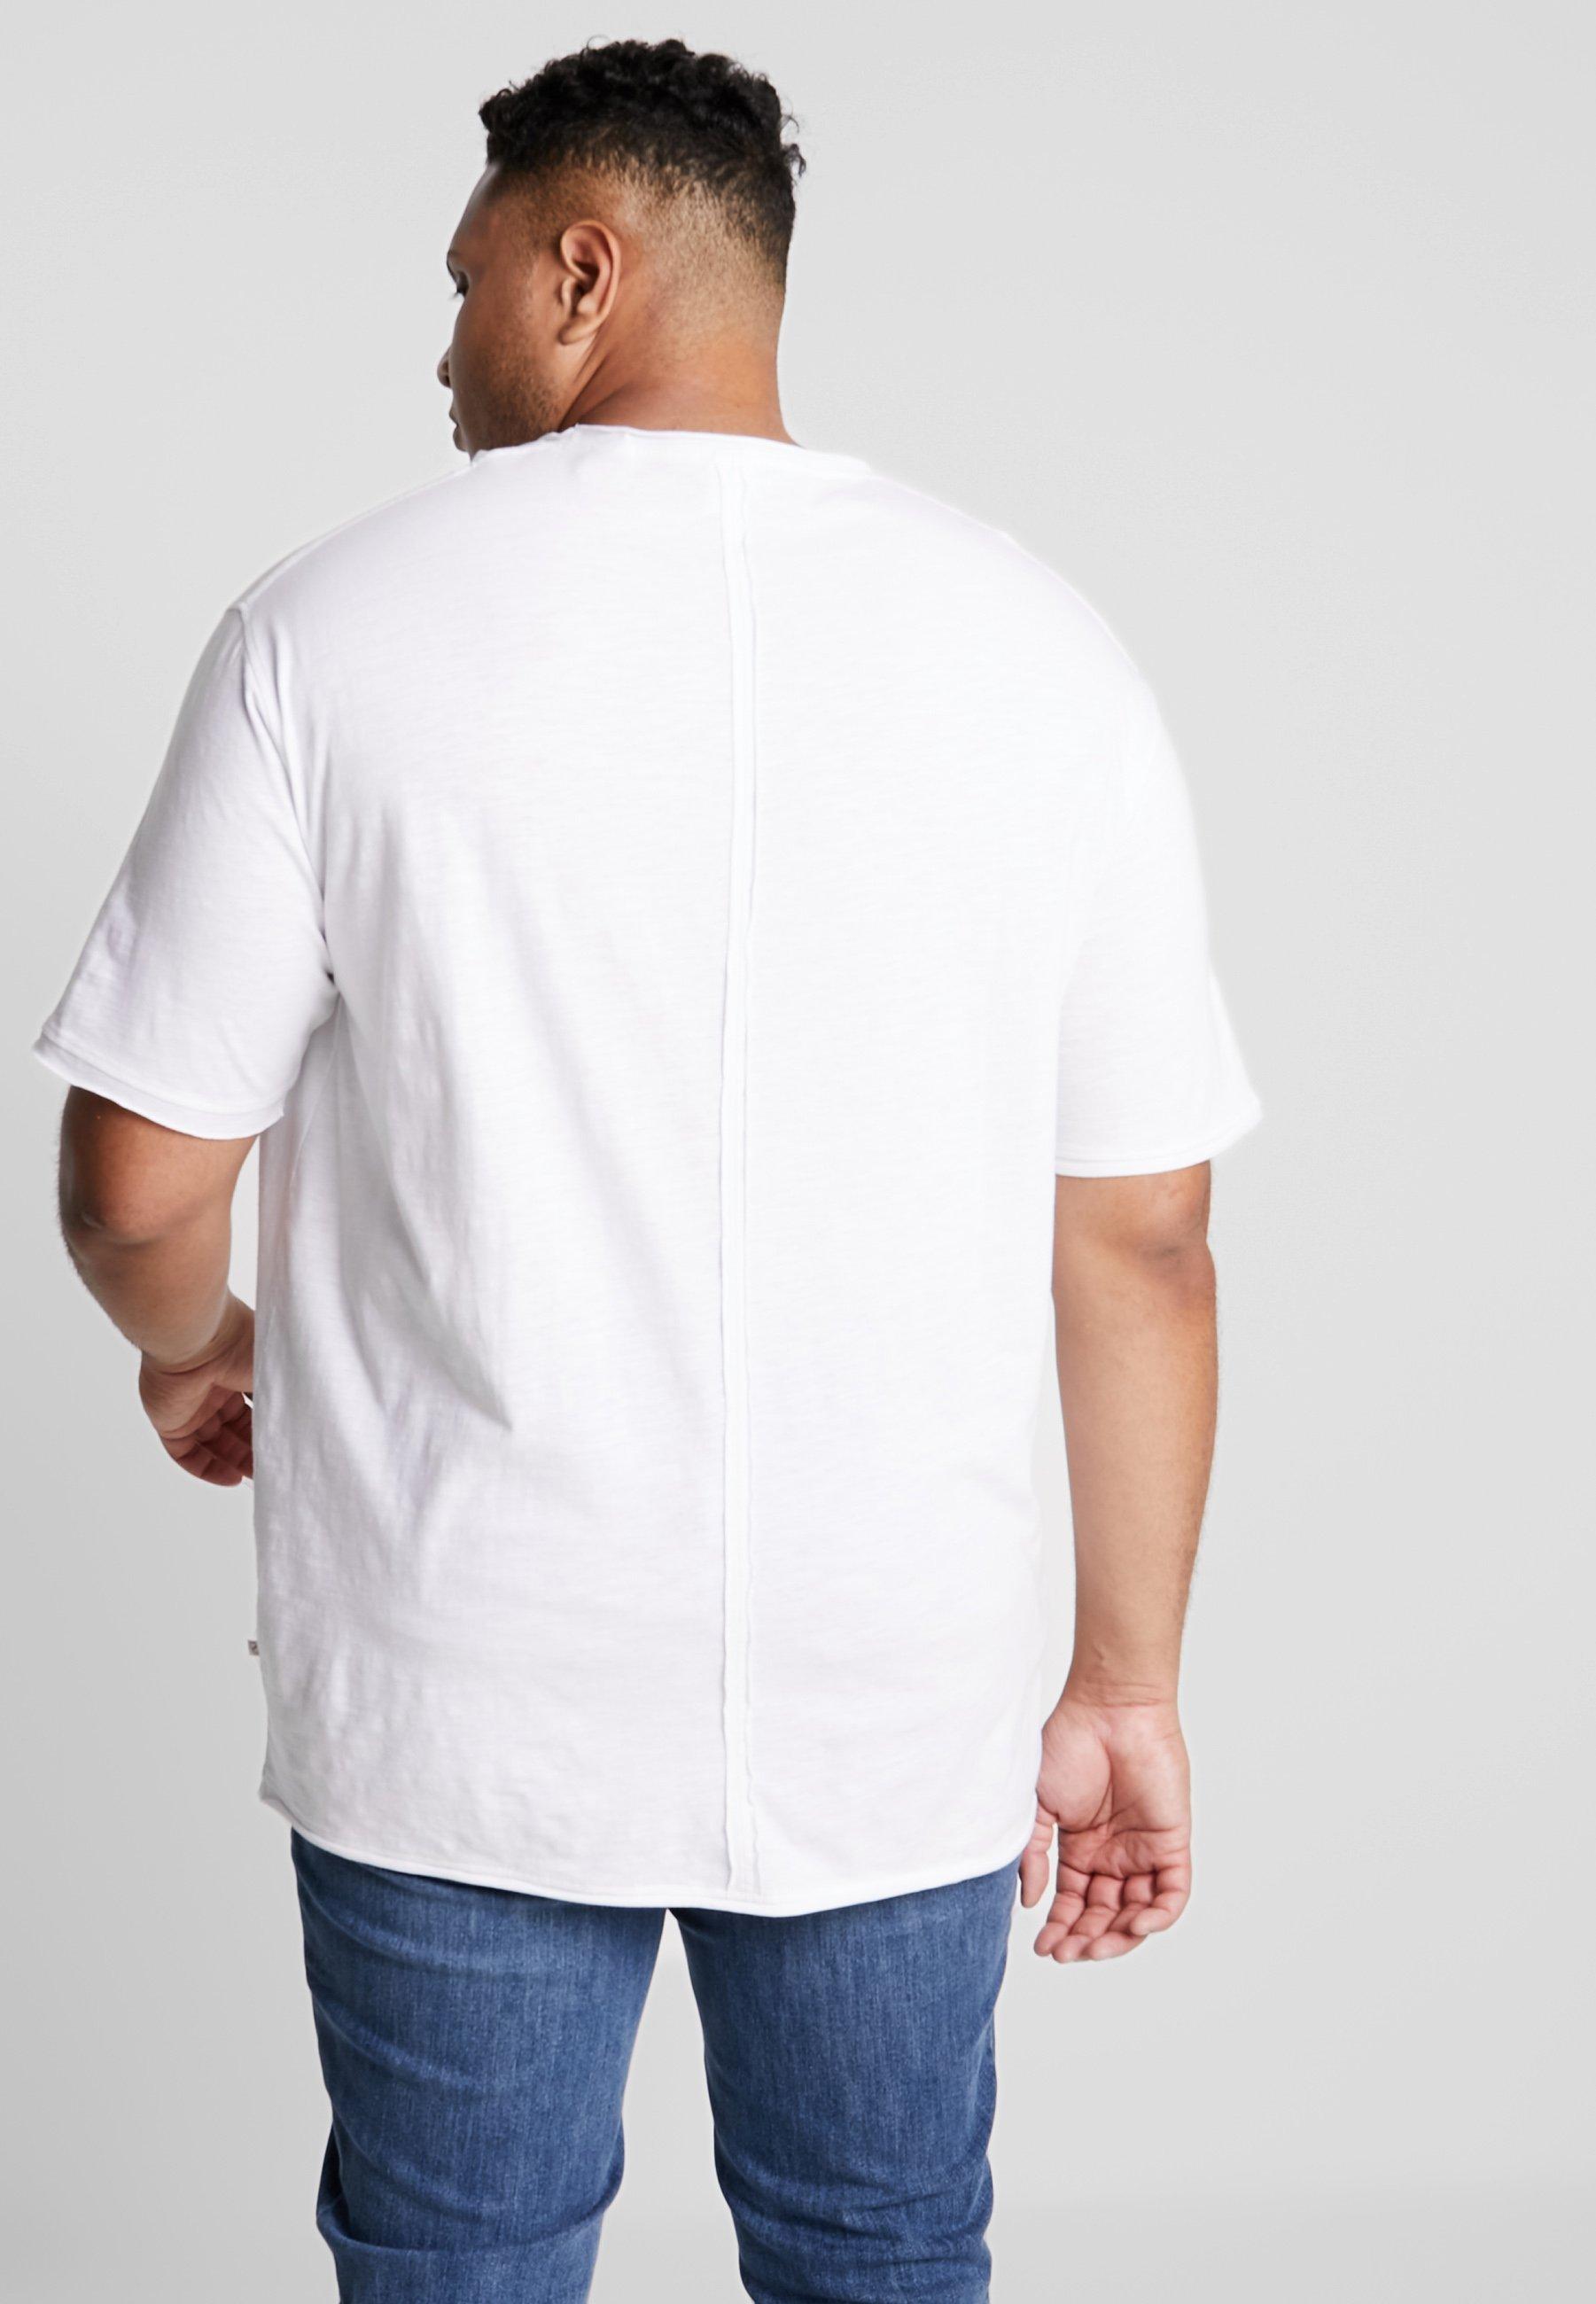 Pocket shirt White Print Imprimé Jack´s Sportswear Slub TeeT Xn0w8OPk